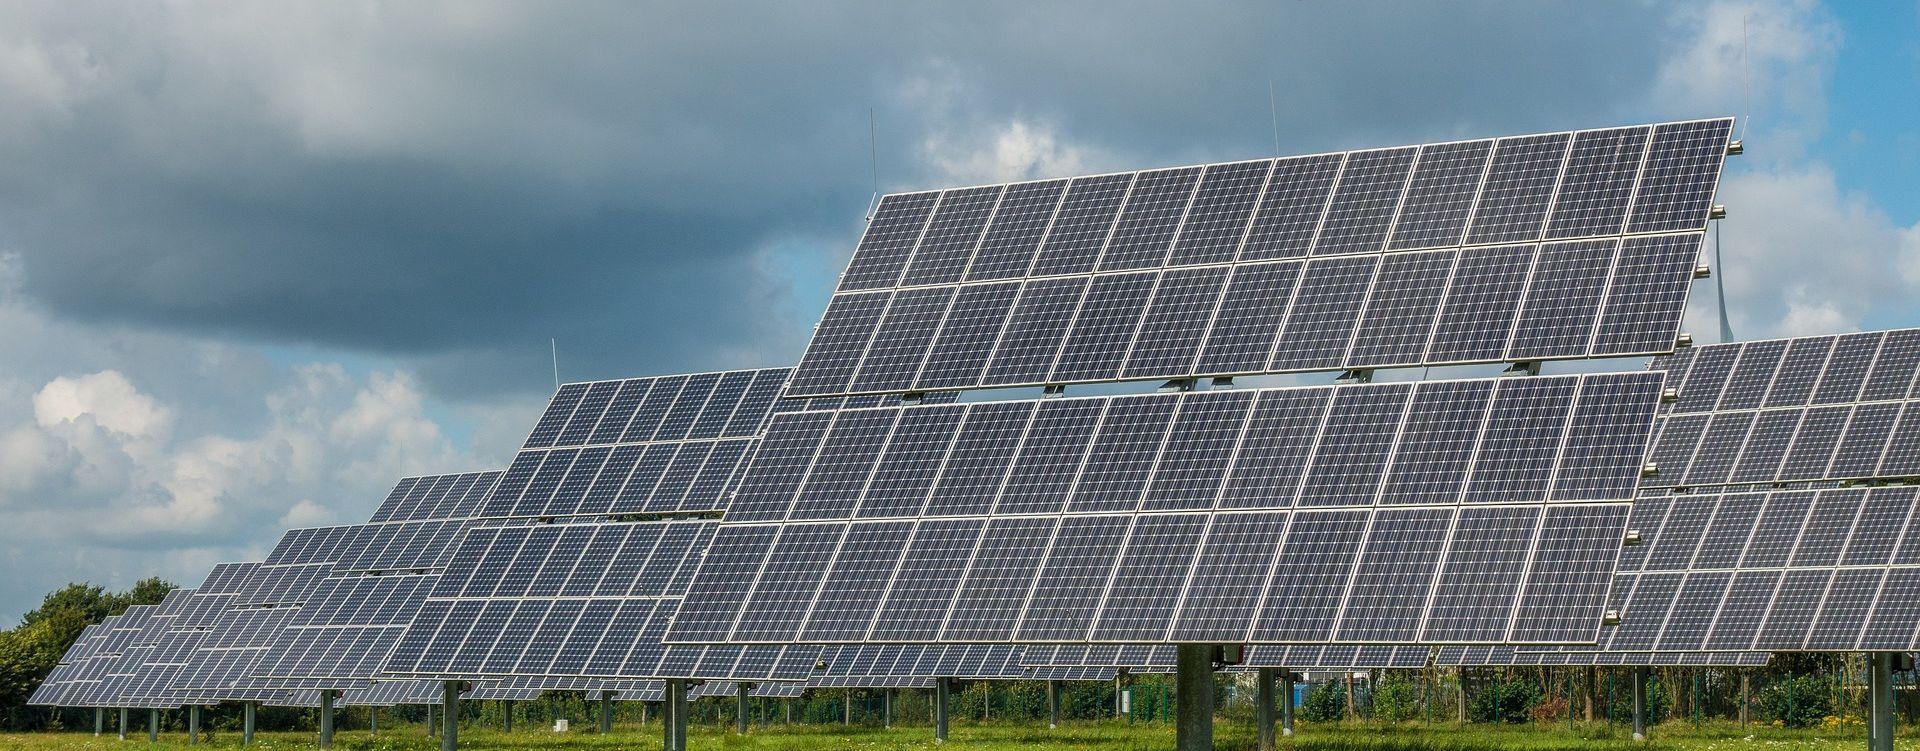 Foto de Paneles solares fotovoltaicos de Portugal